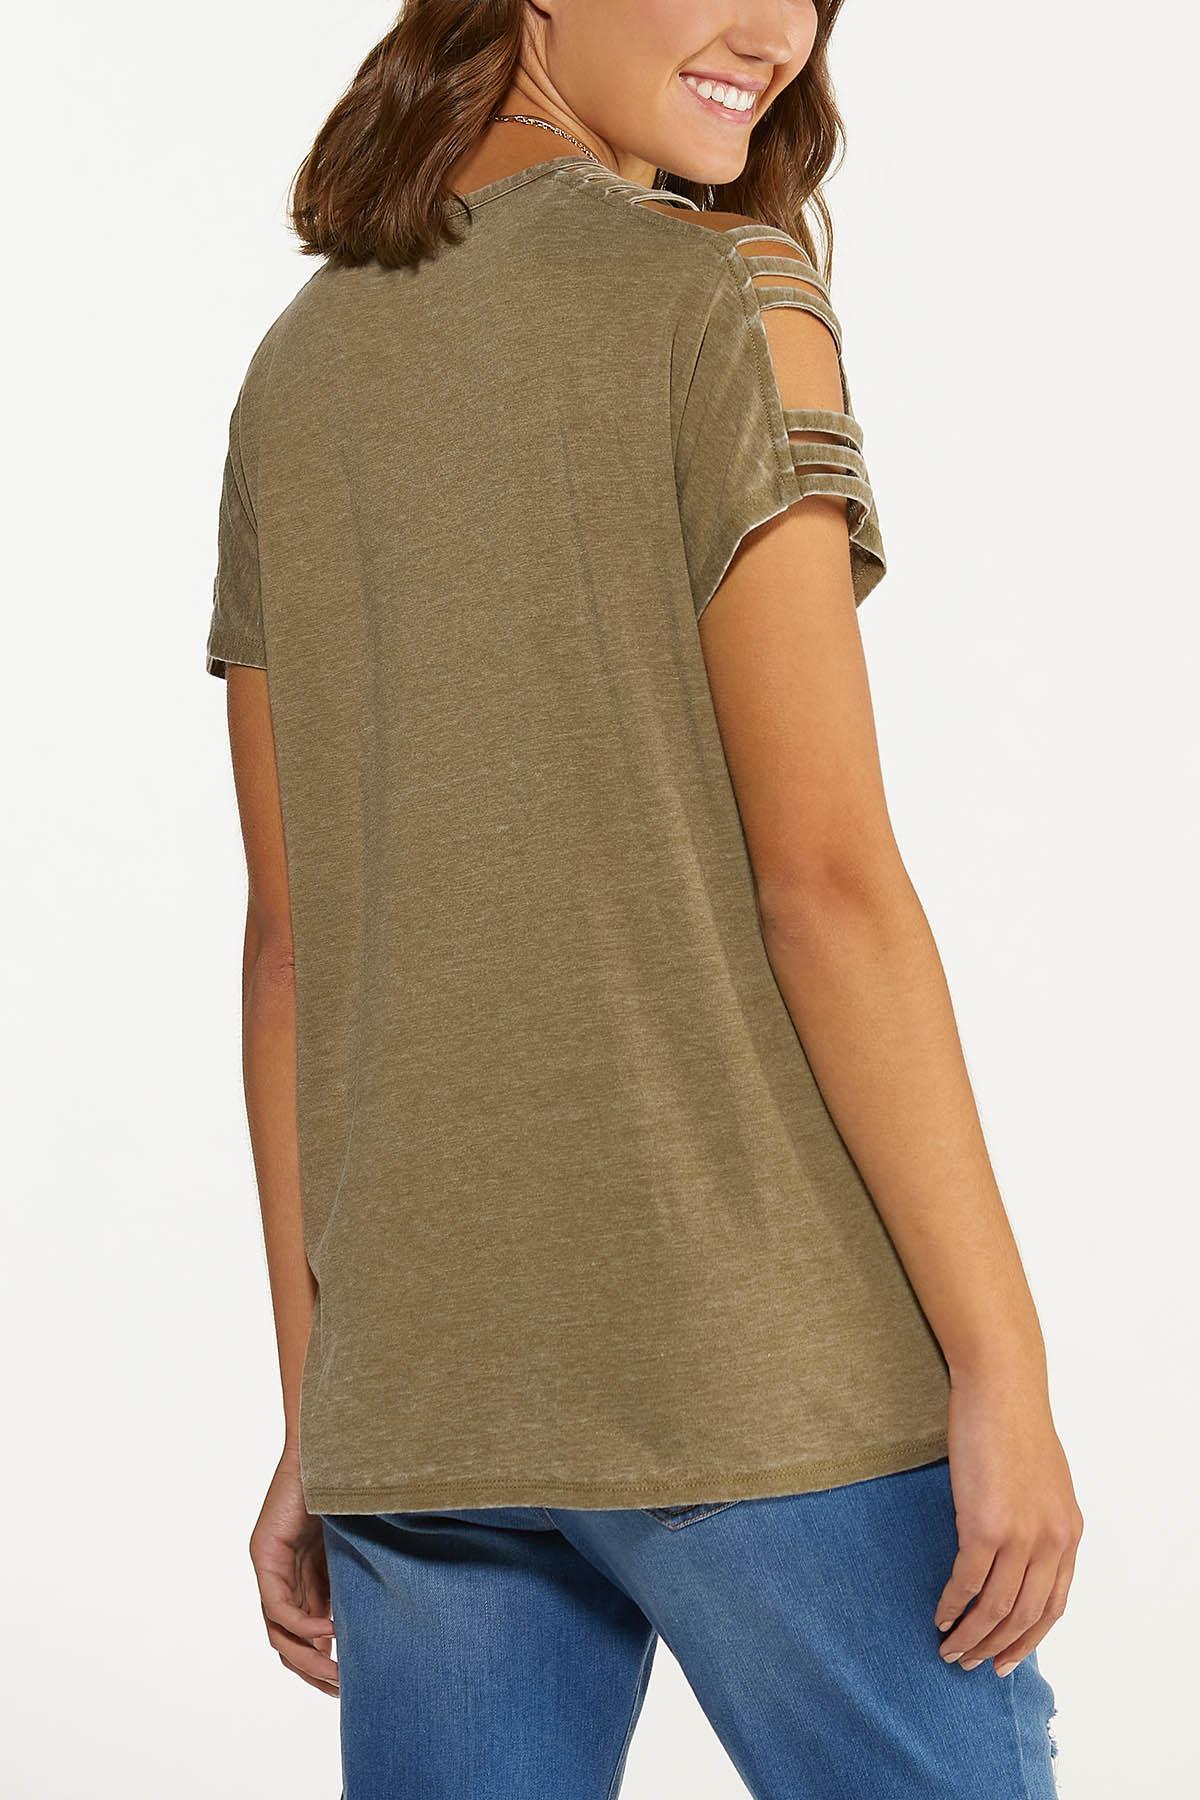 Olive Cutout Cold Shoulder Top (Item #44739263)